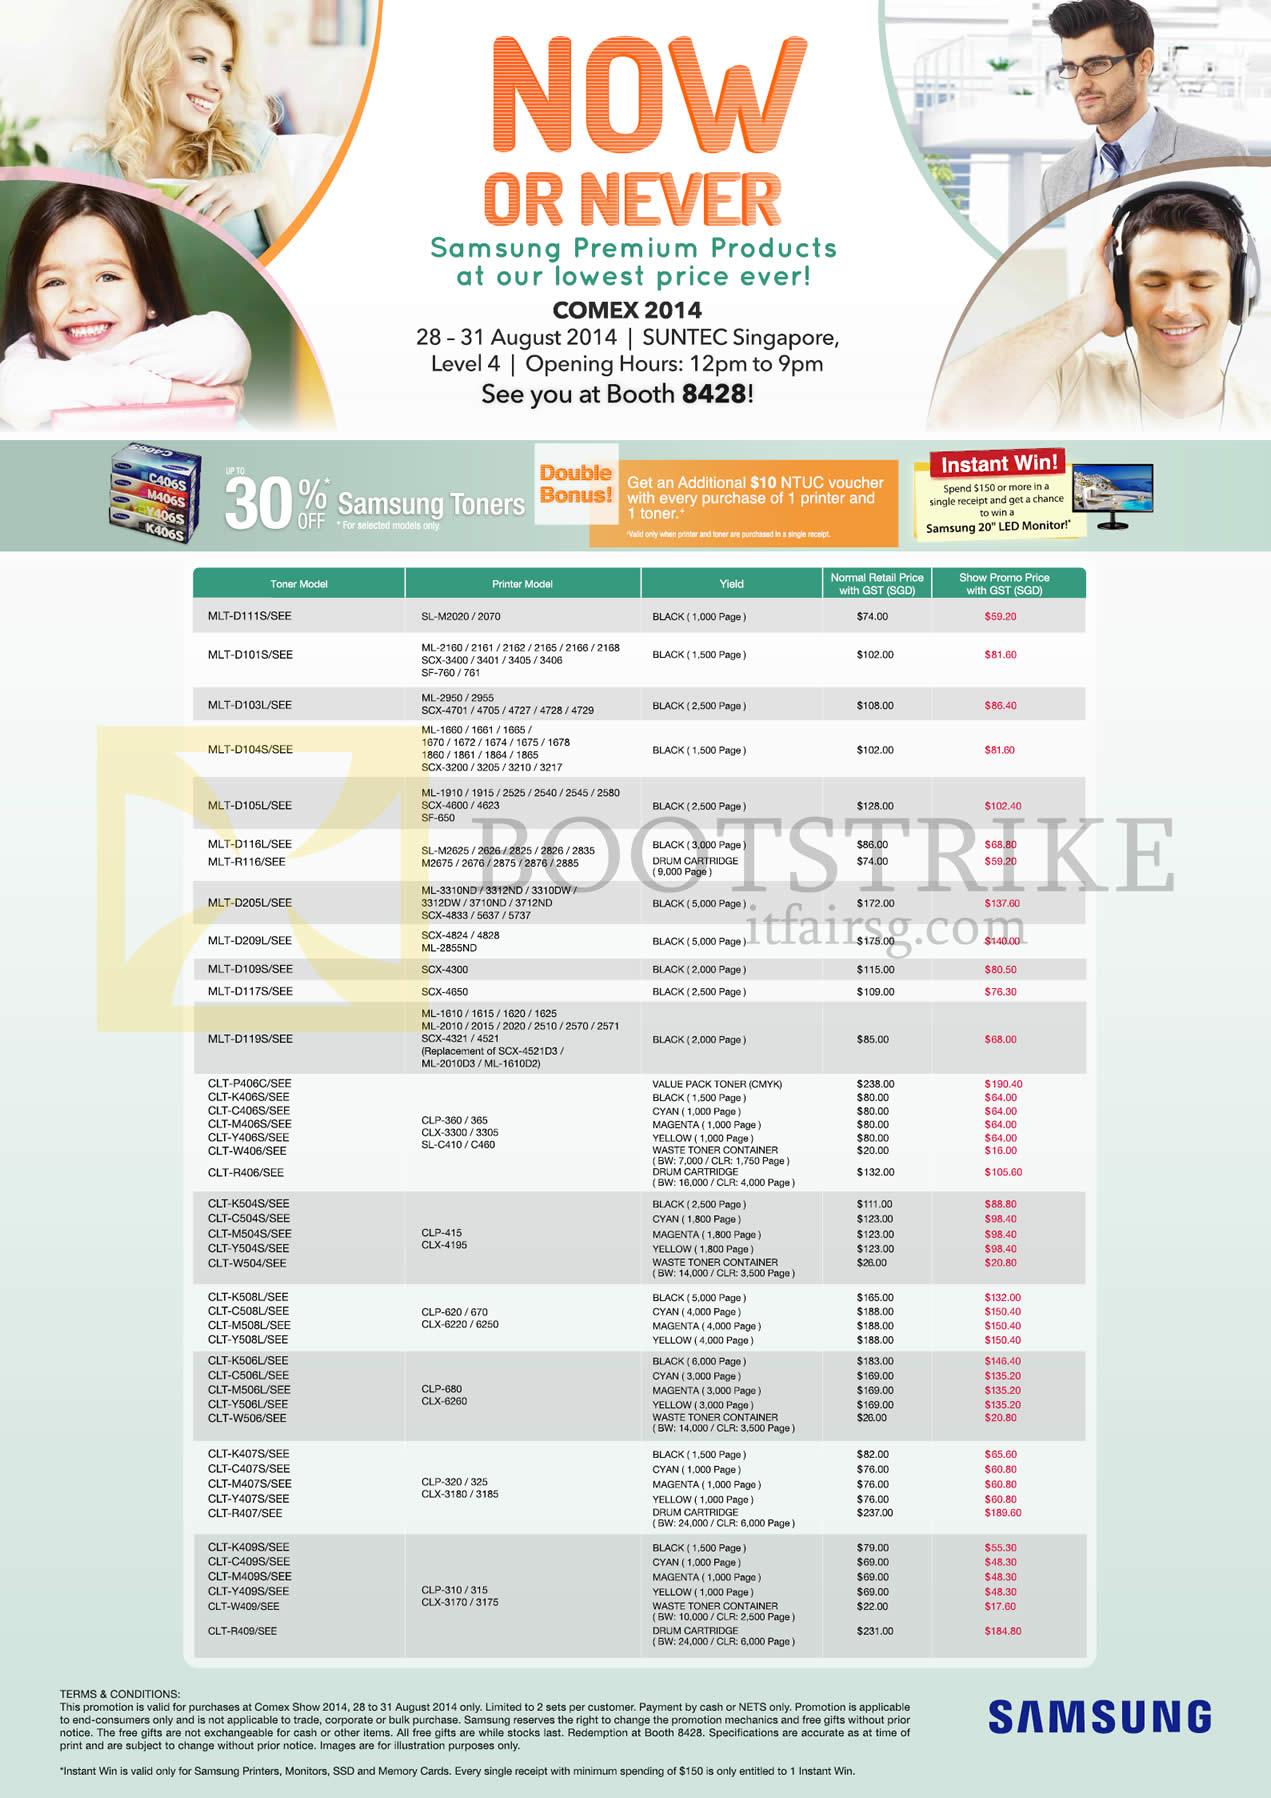 COMEX 2014 price list image brochure of Samsung Printers Toners